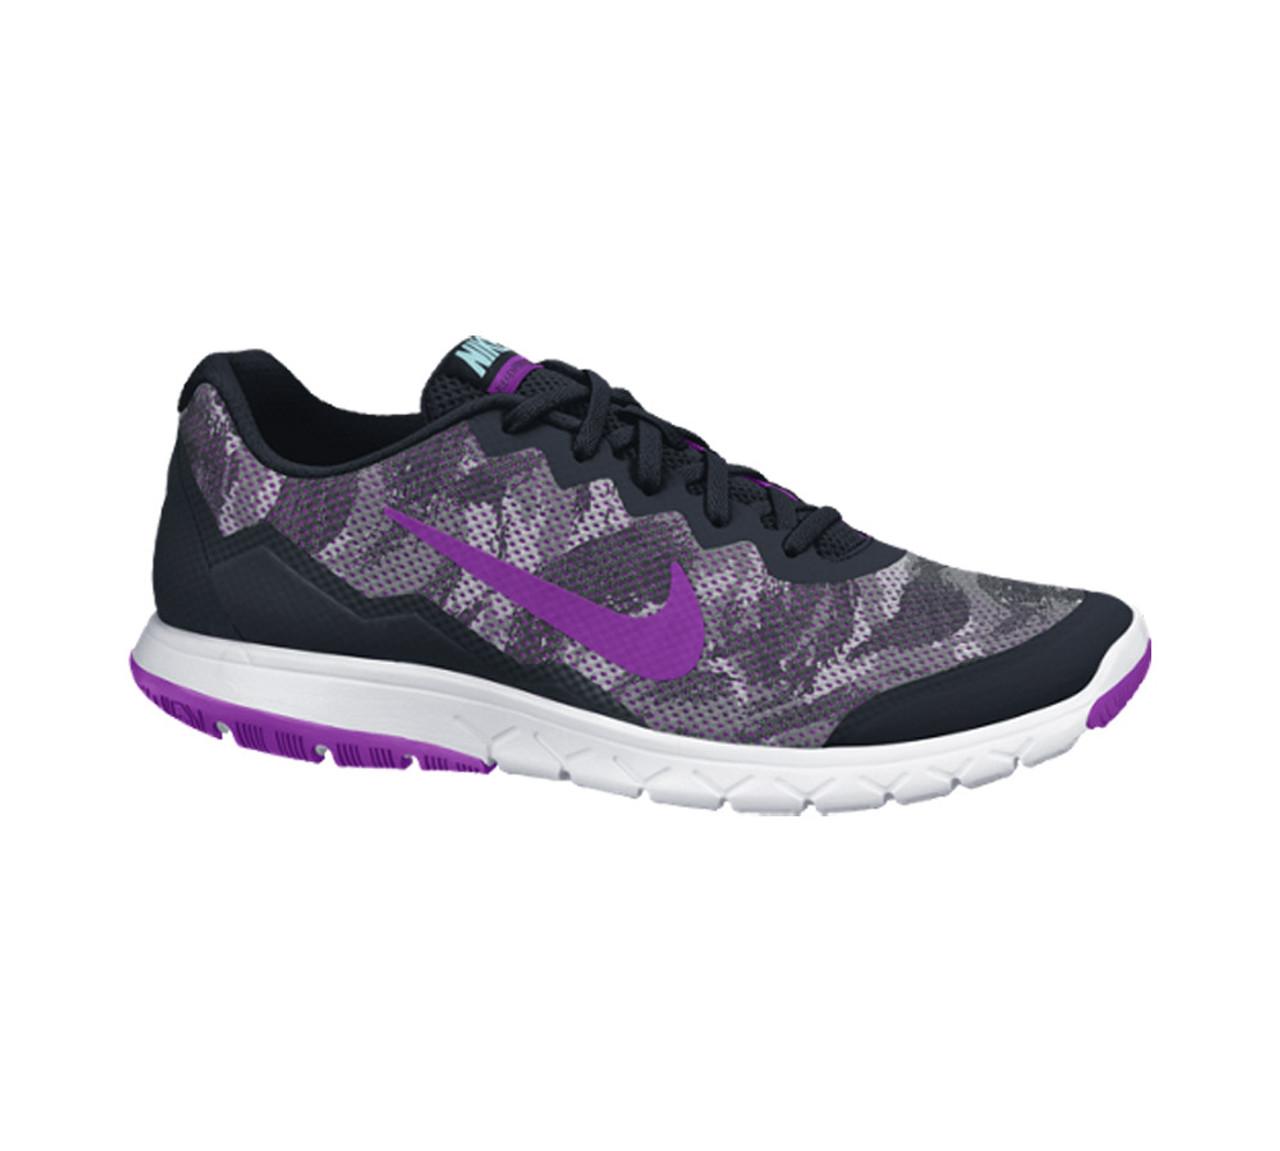 a06bb67e7784 Nike Women s Flex Experience RN 4 Prem Running Shoe Black Purple - Shop now